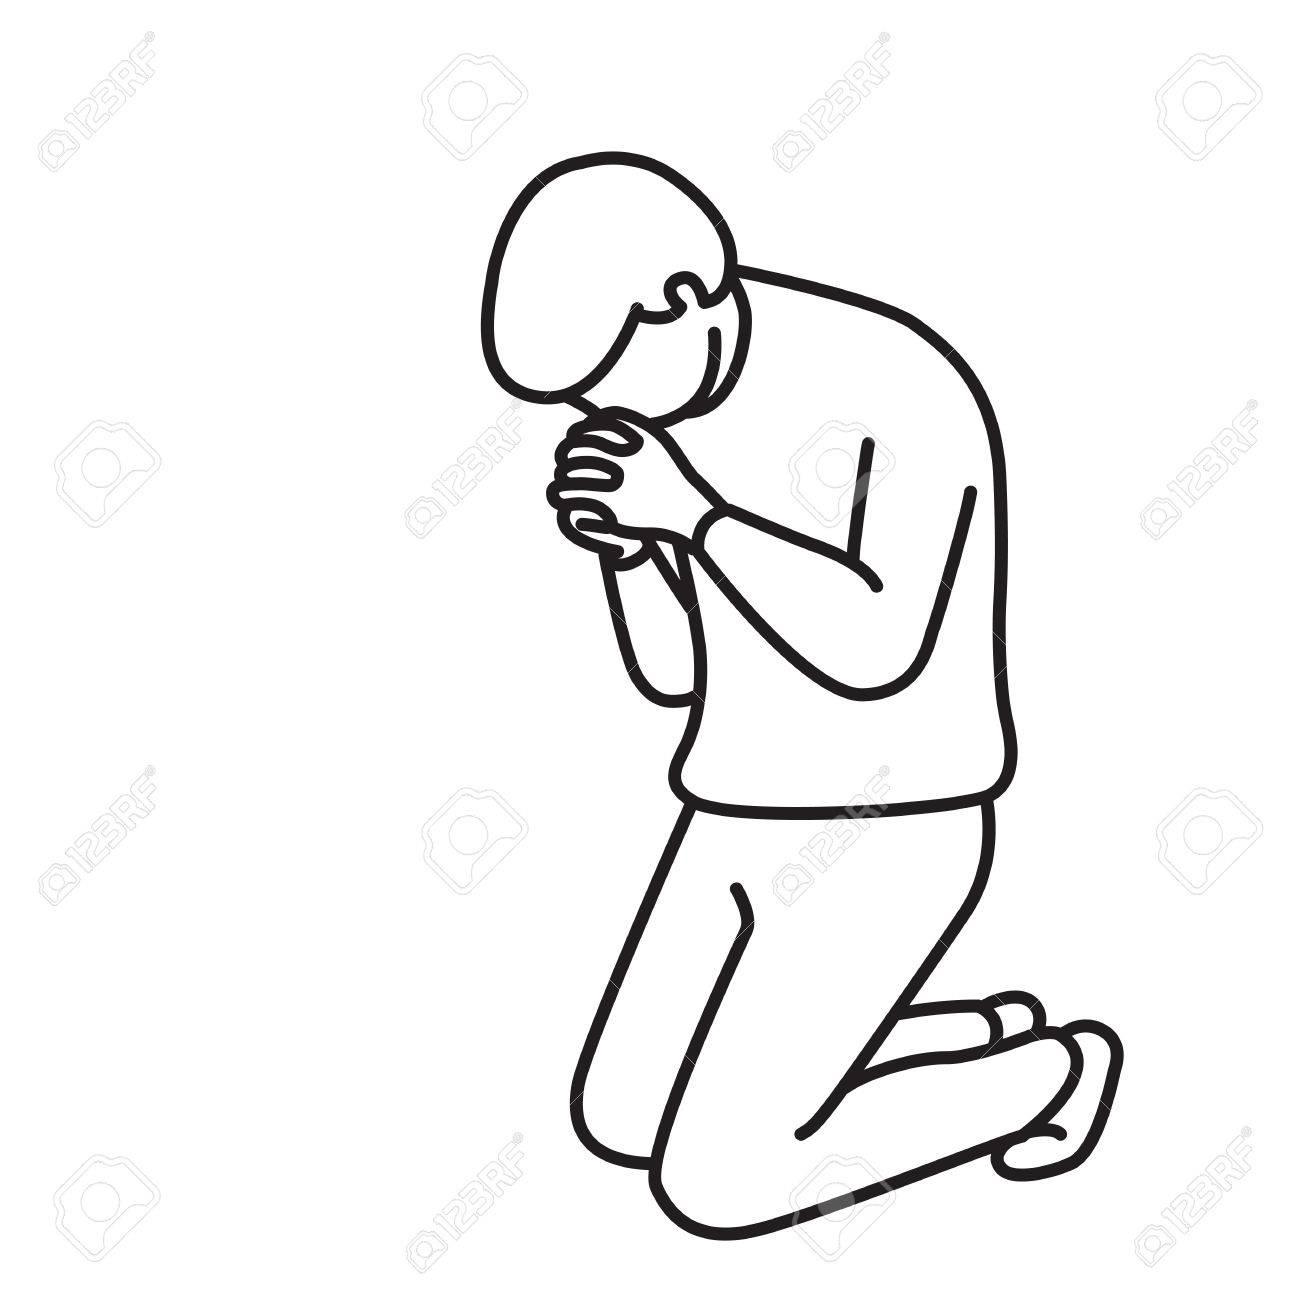 Person Praying Drawing At Getdrawings